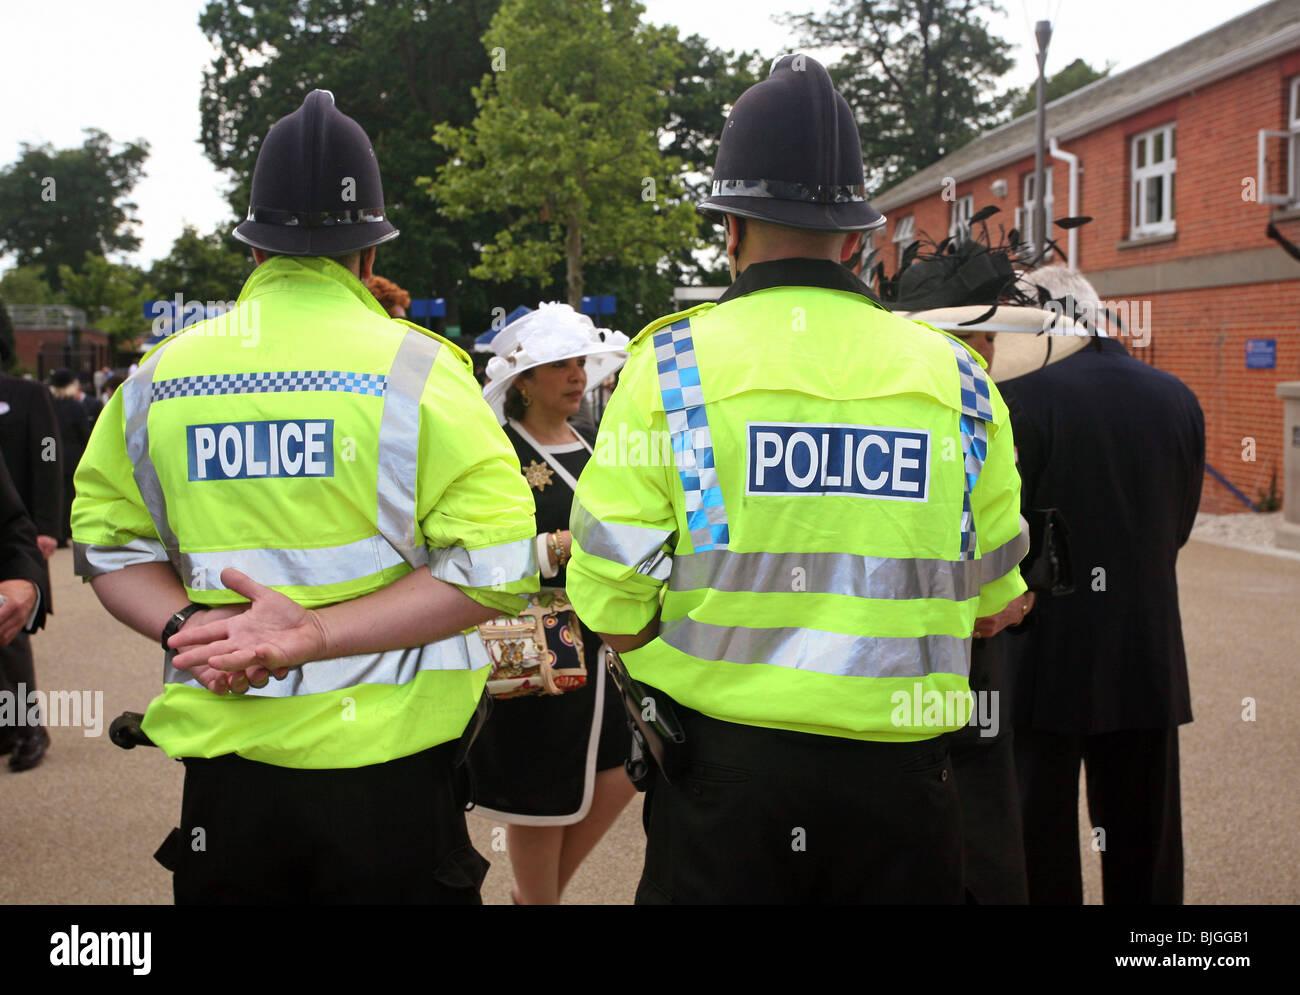 Policemen at the Royal Ascot horse races, Great Britain - Stock Image